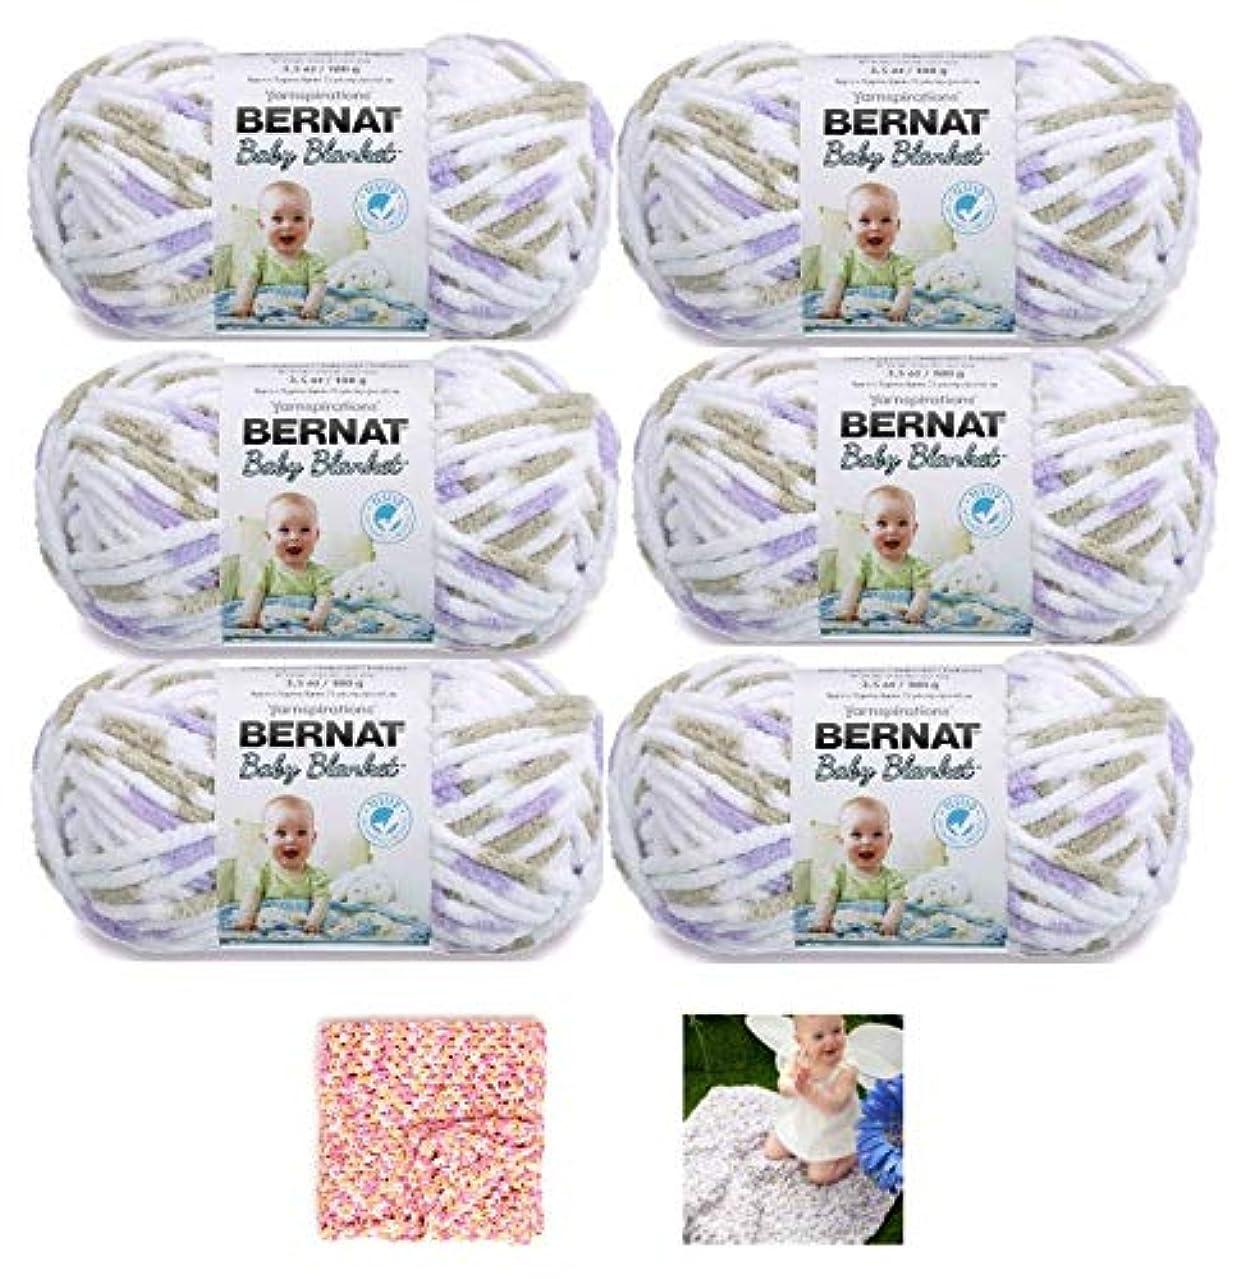 Bernat Baby Blanket Yarn - 6 Pack Bundle with 2 Patterns - Little Lilac Dove